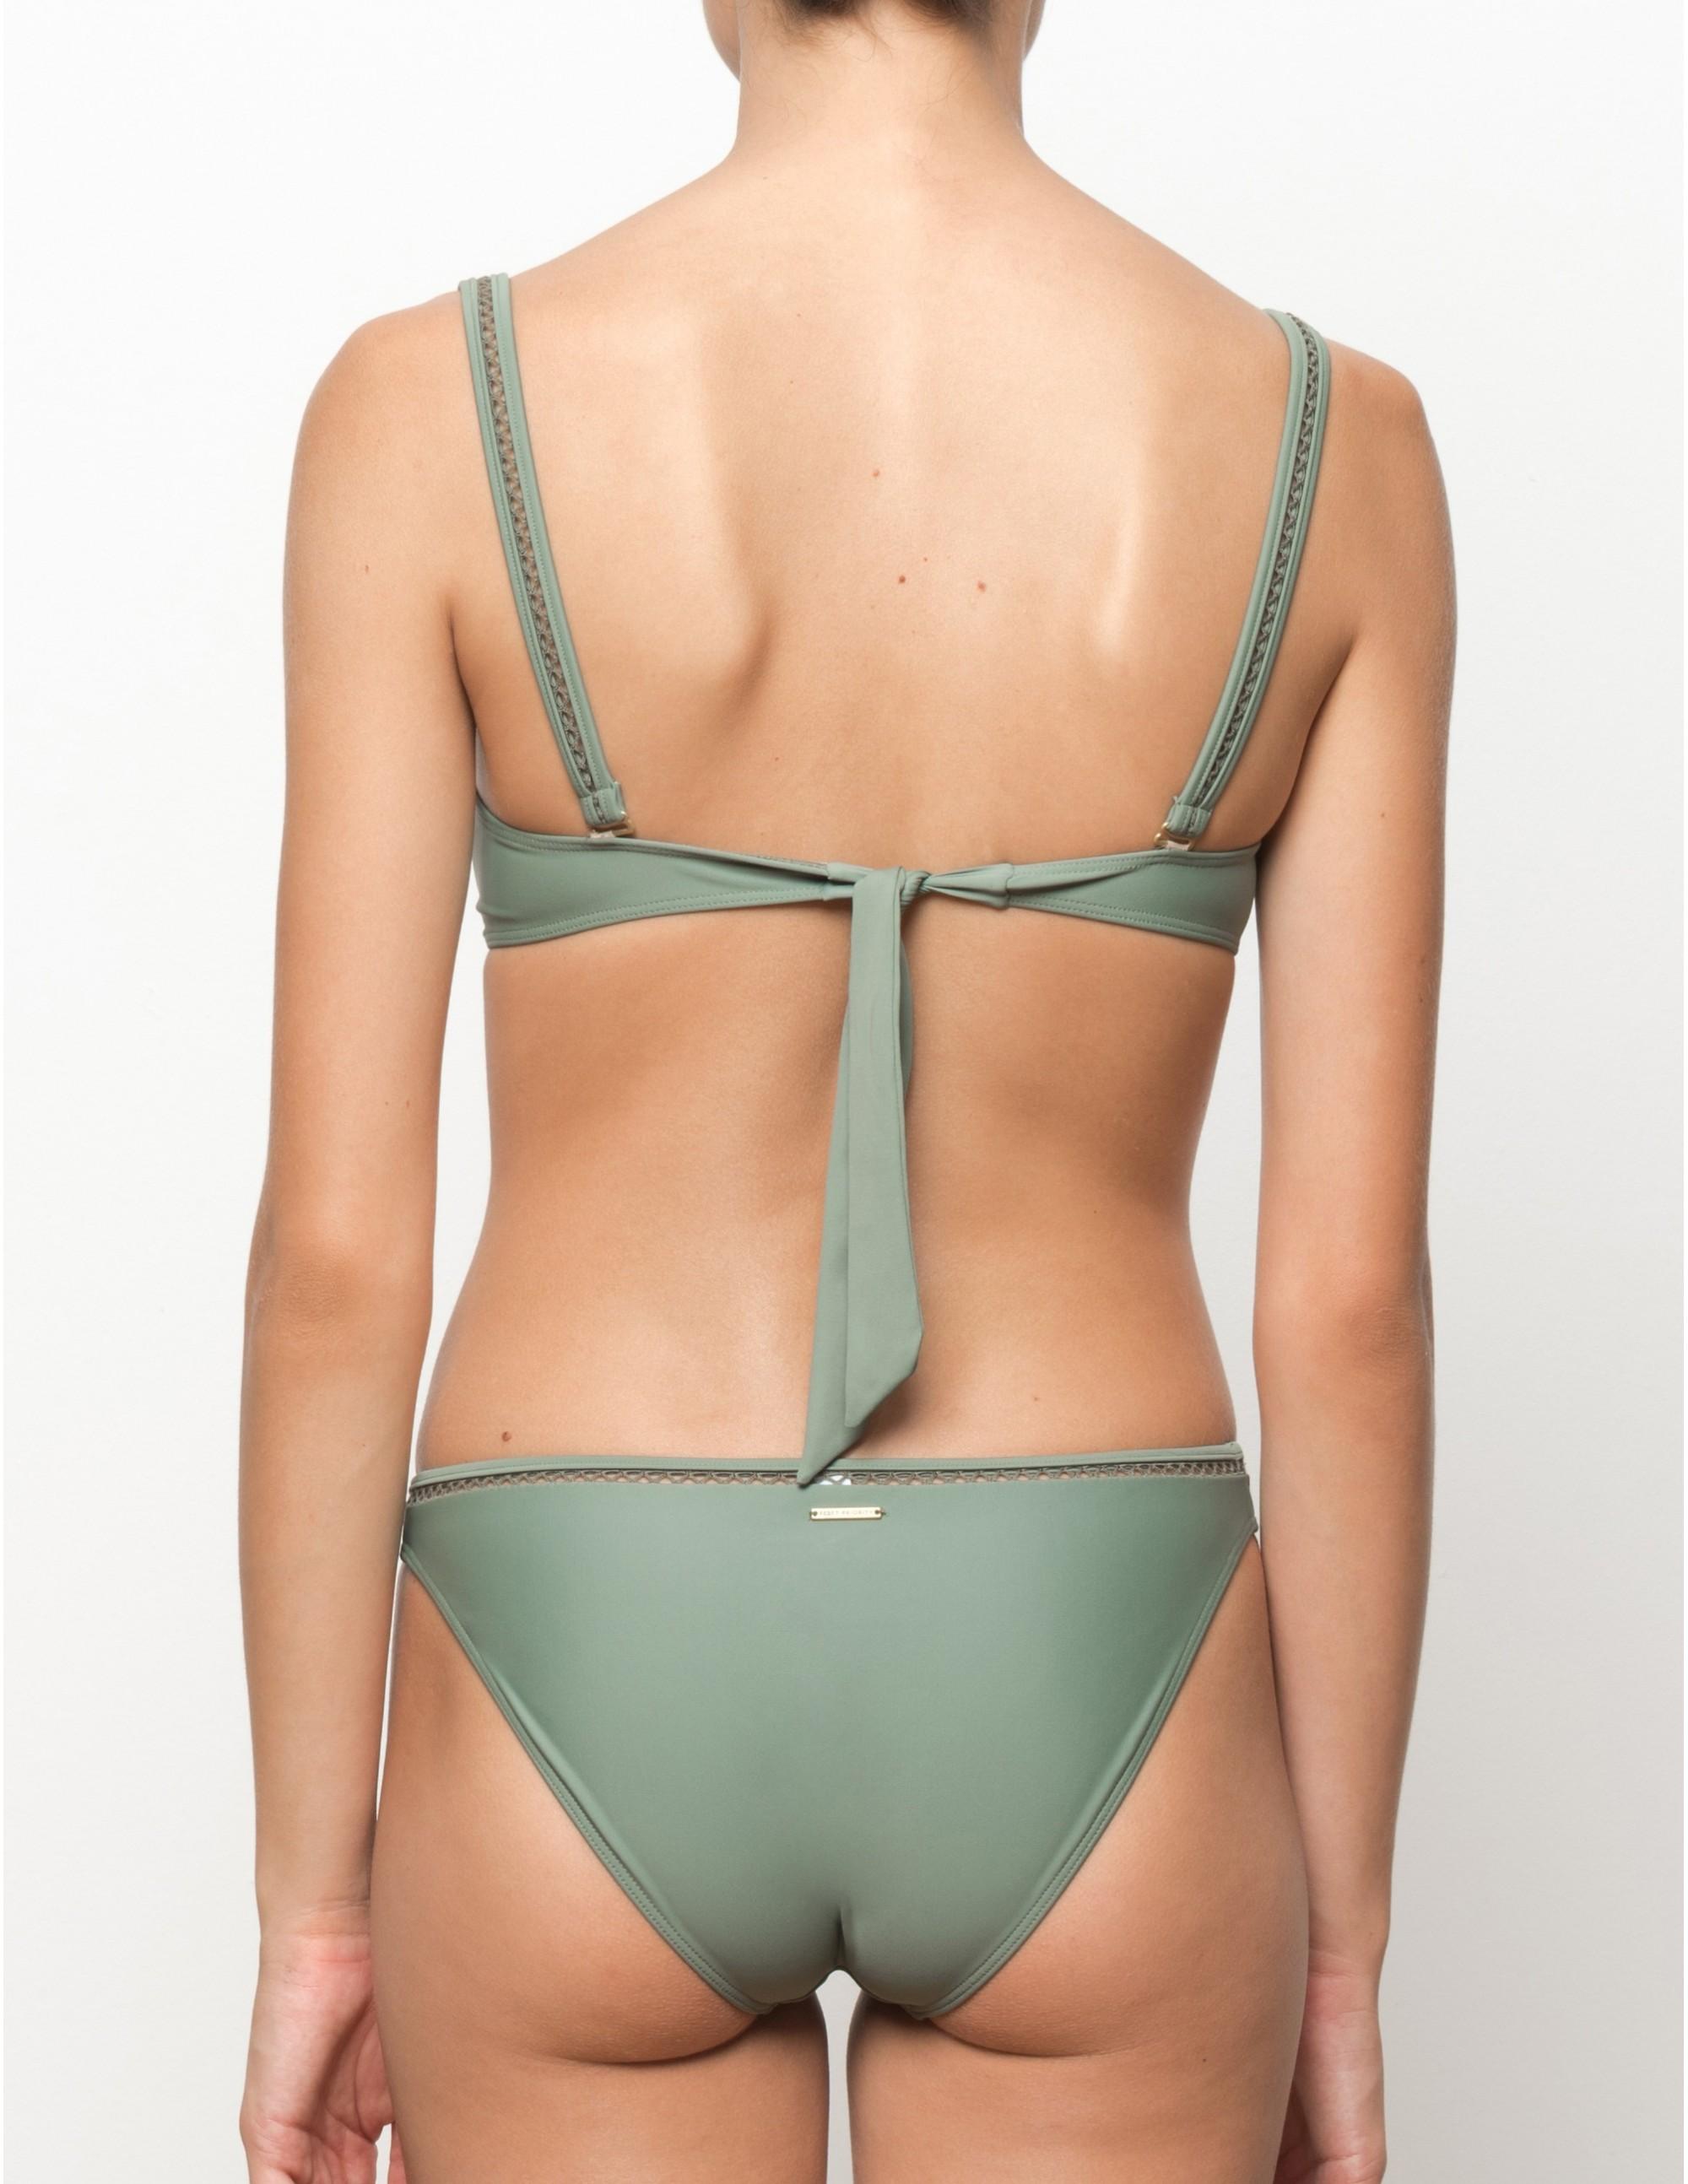 BELLA bikini bottom - SERENGETI